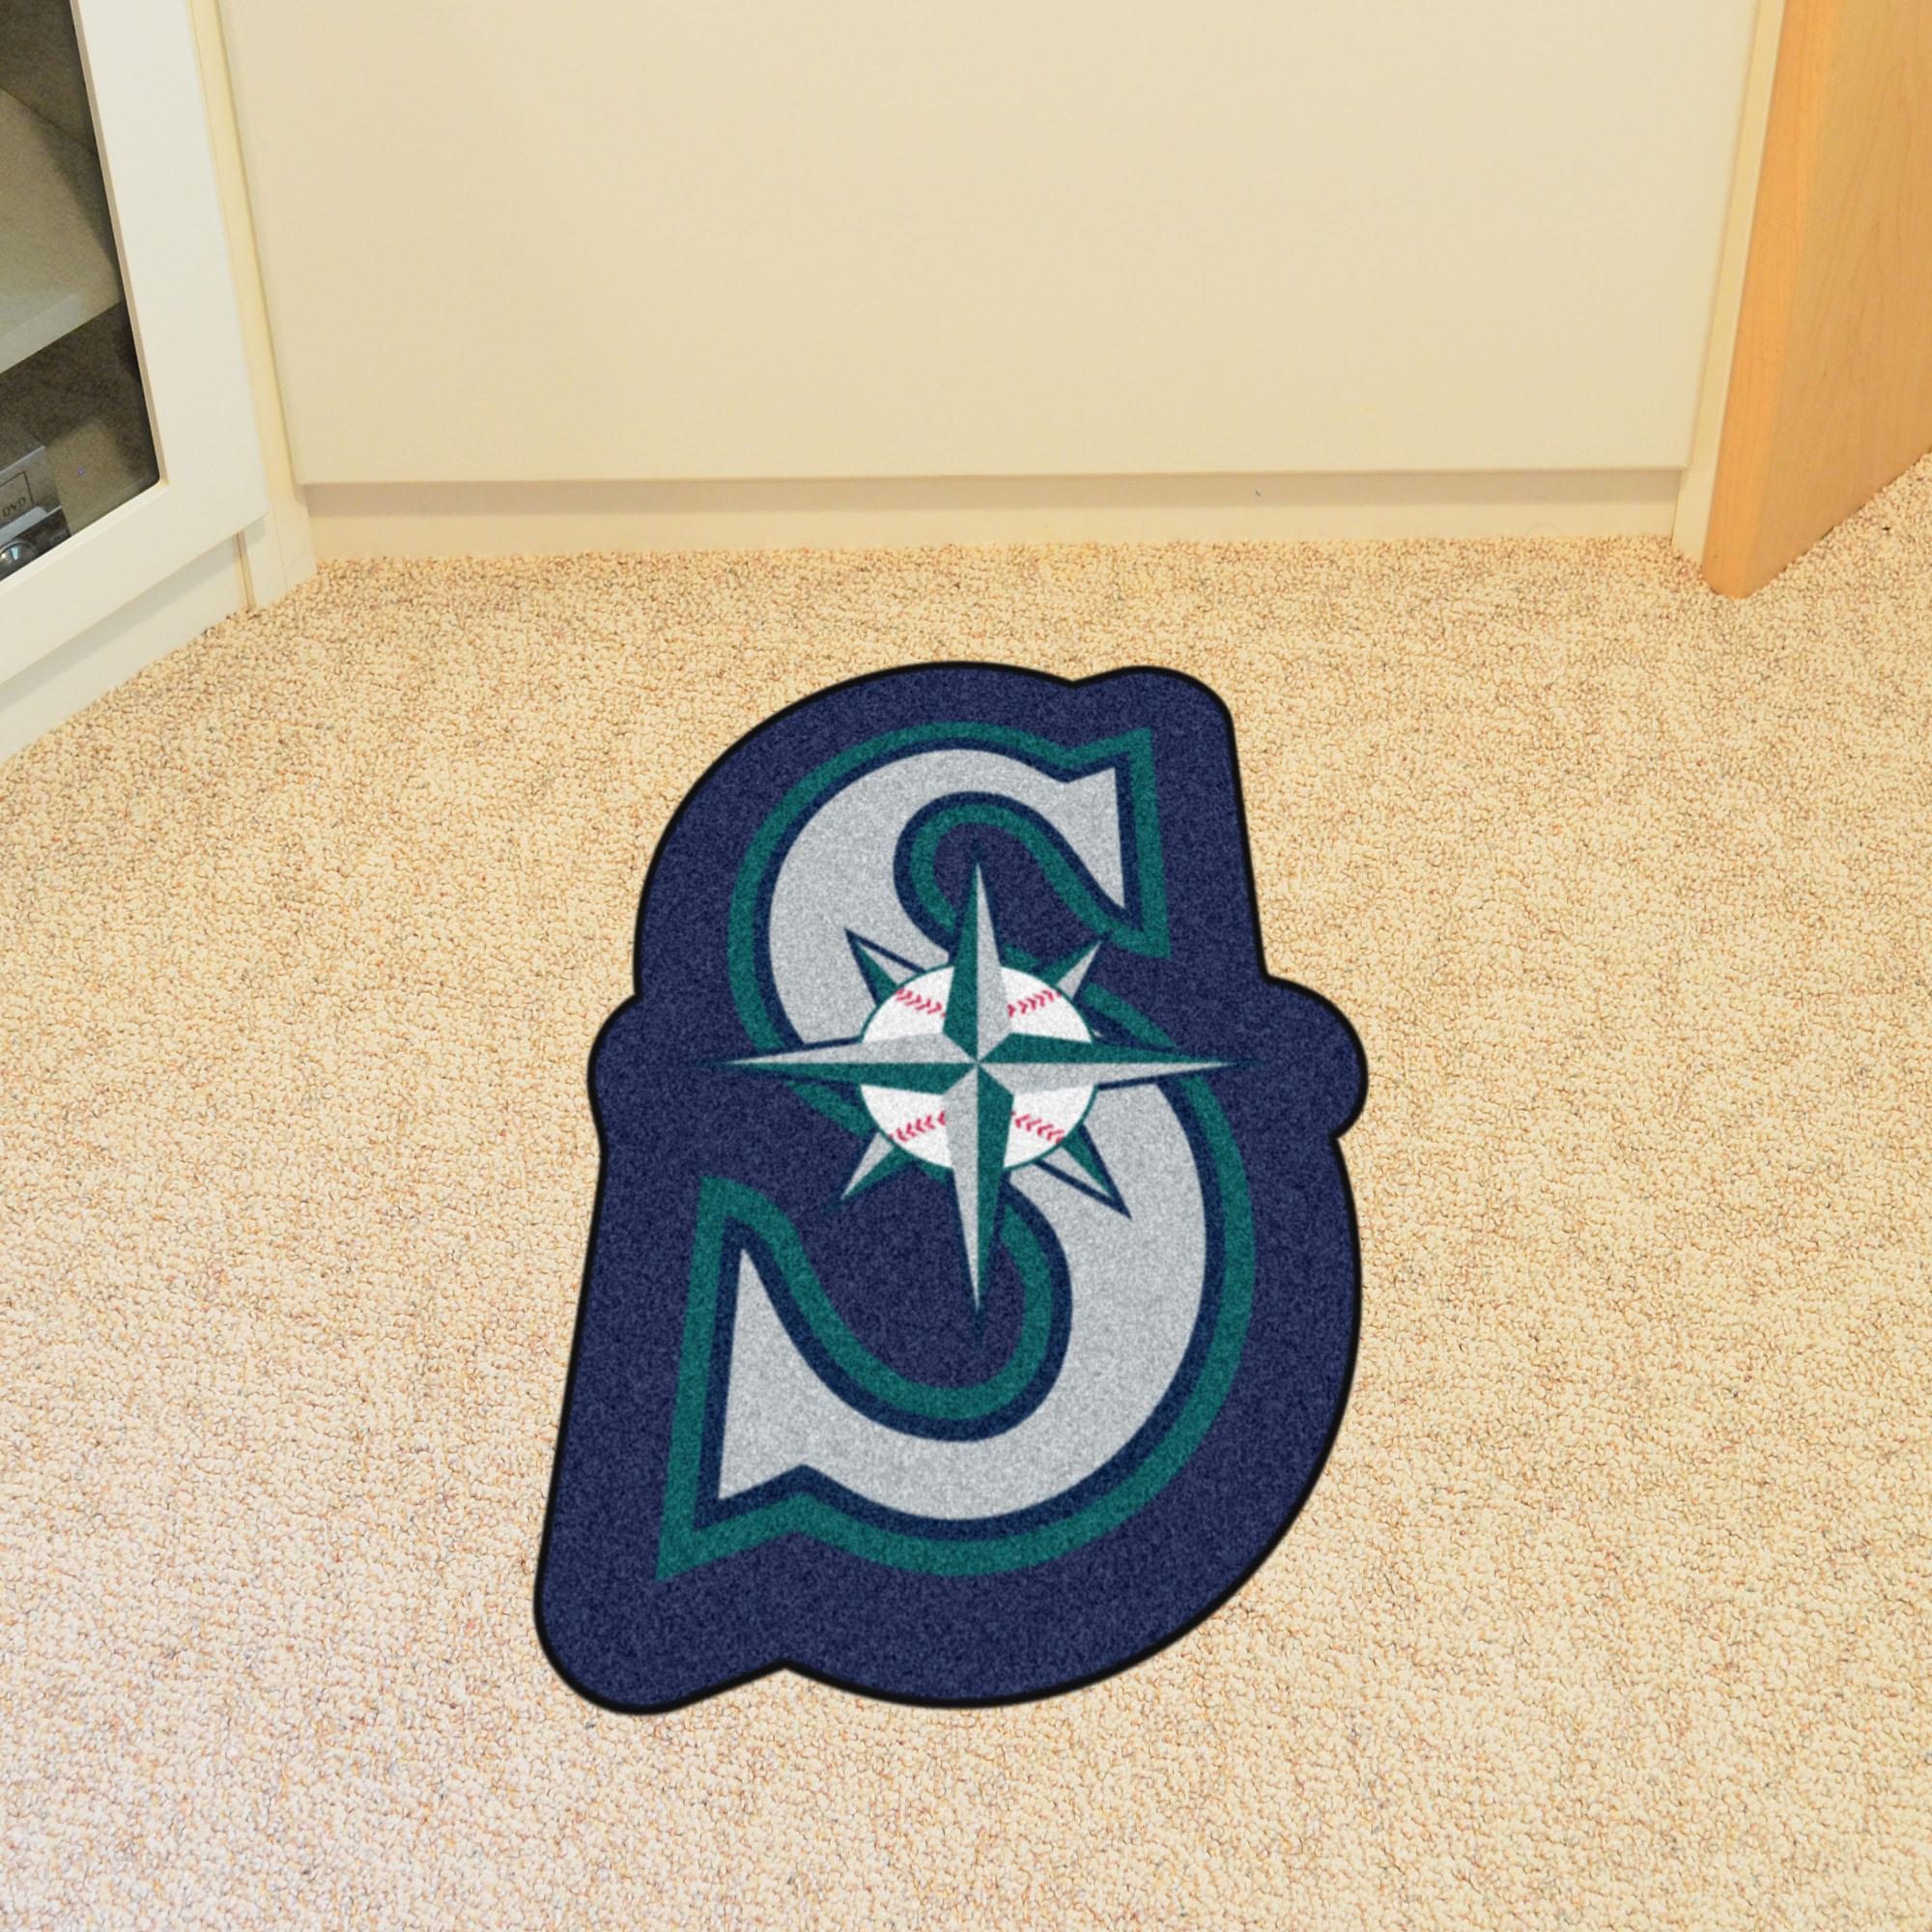 Seattle Mariners MLB MASCOT Mat